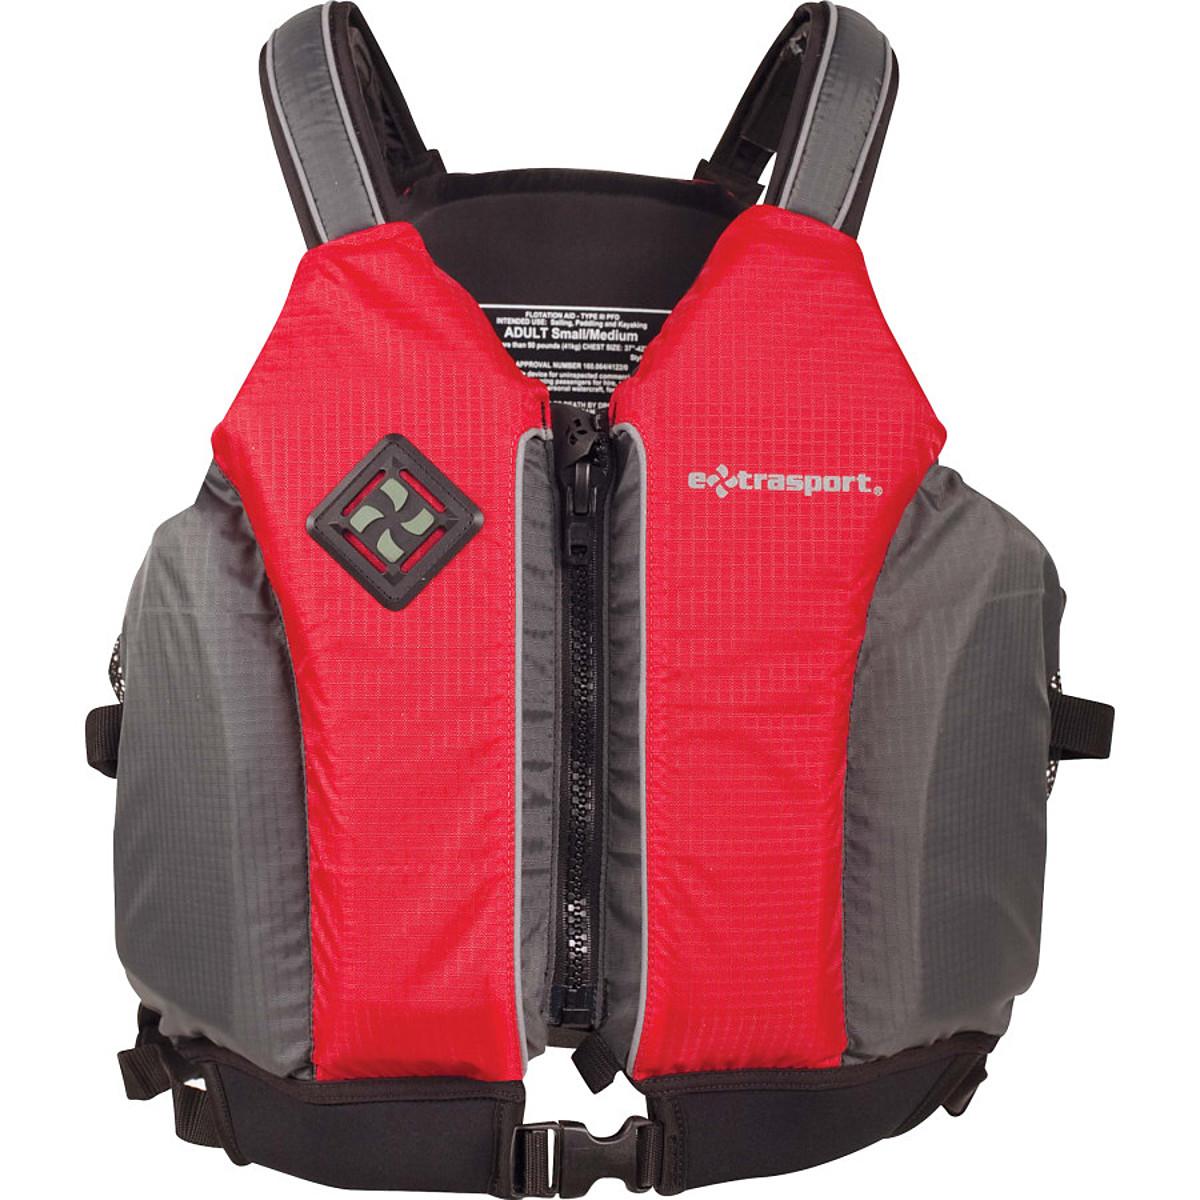 photo: Extrasport Vortex life jacket/pfd